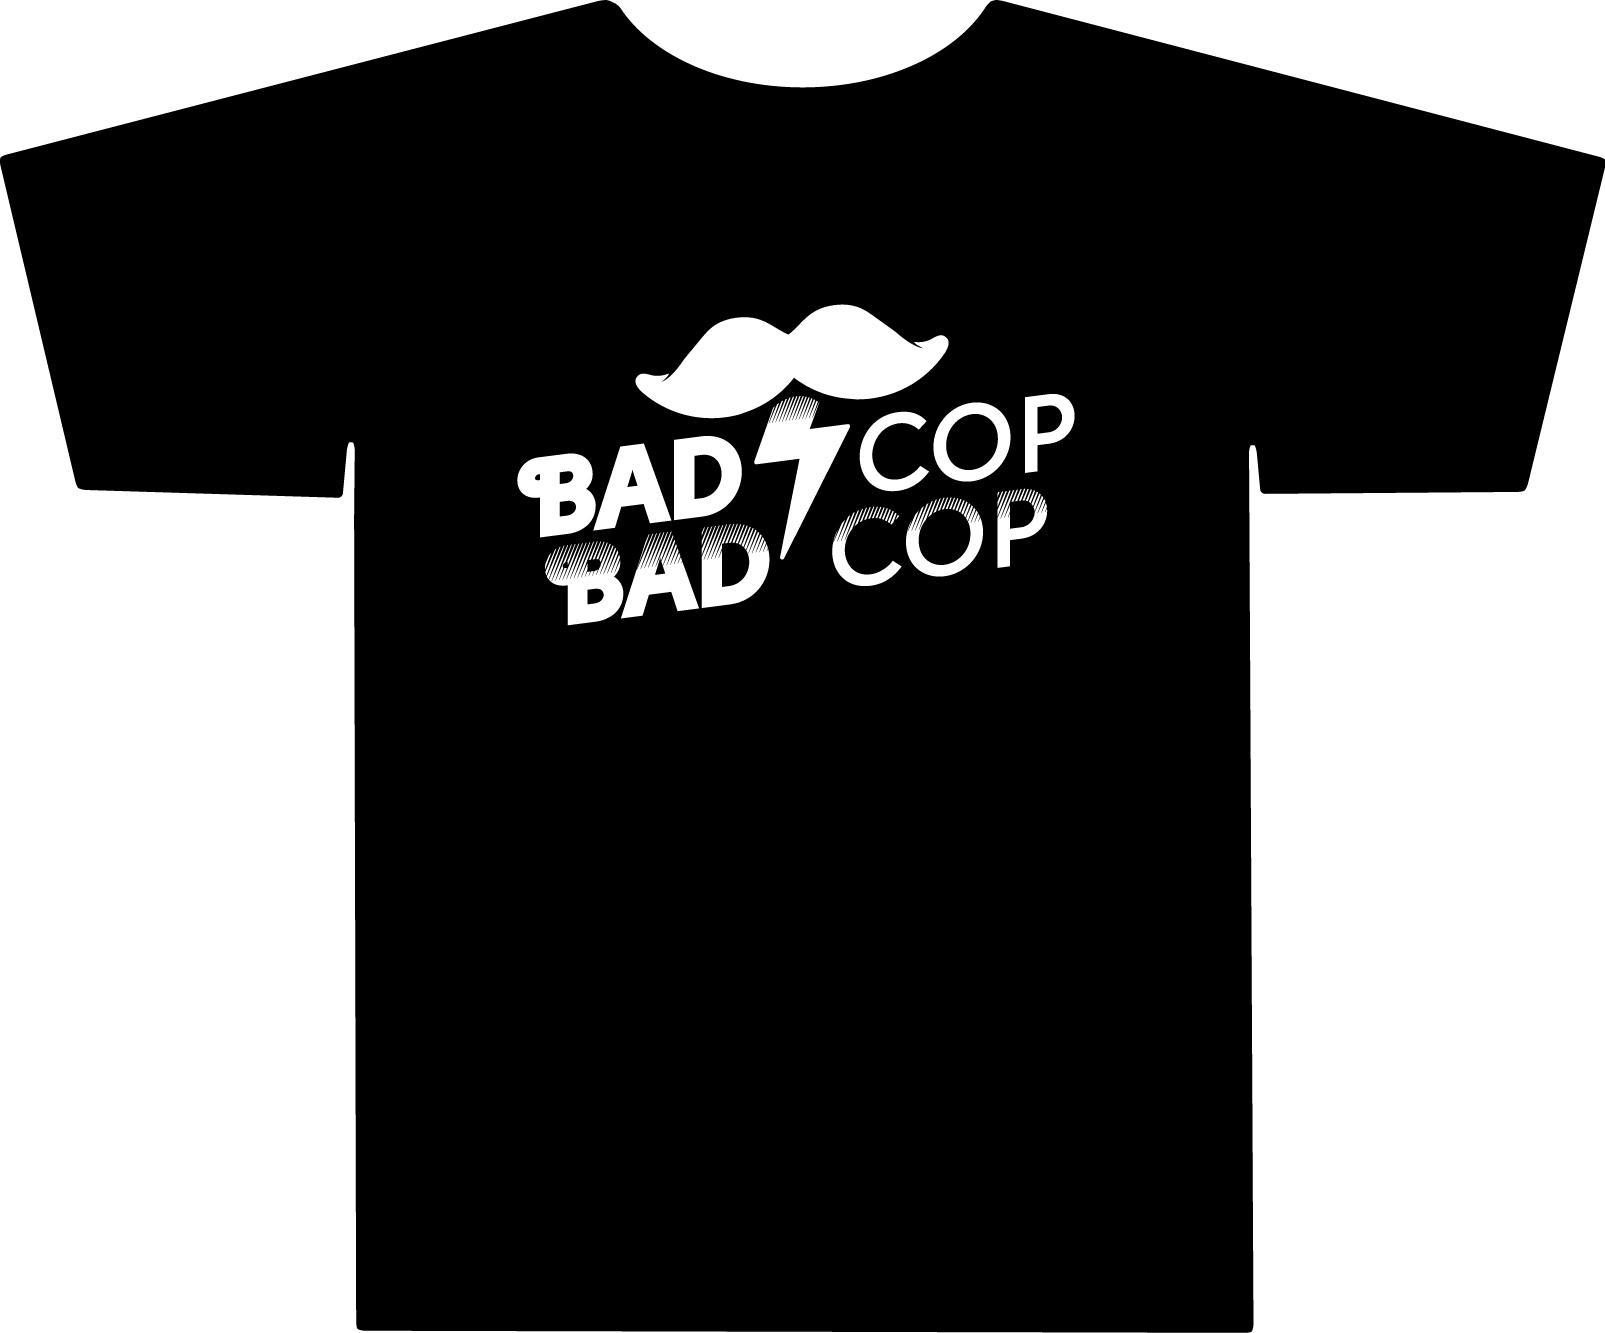 Bad Cop Bad Cop - image 3 - student project